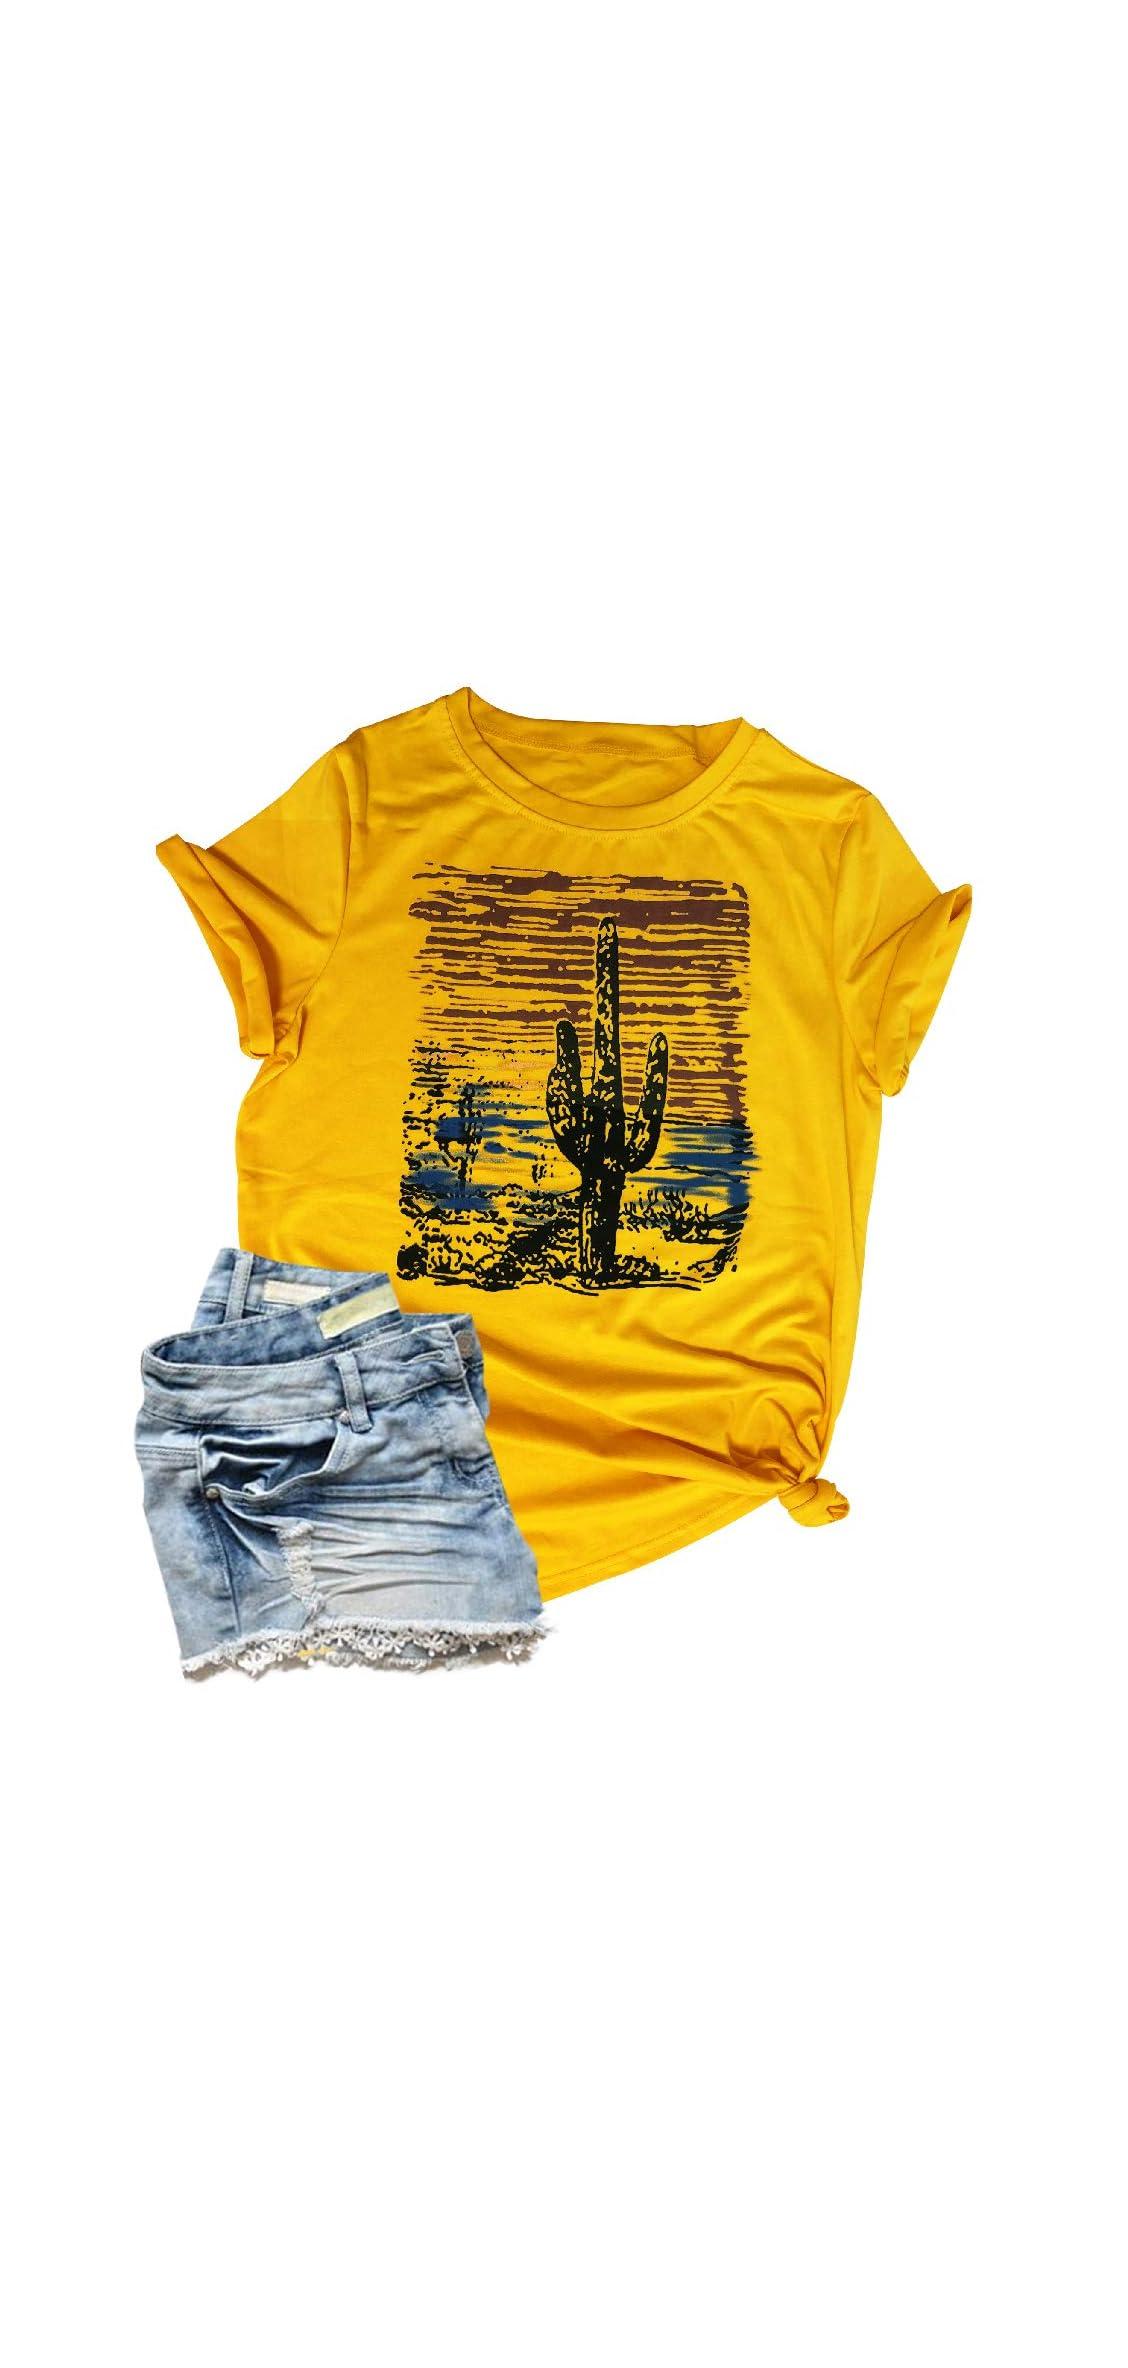 Western Tees For Women Vintage Cactus Shirt Retro Sunset